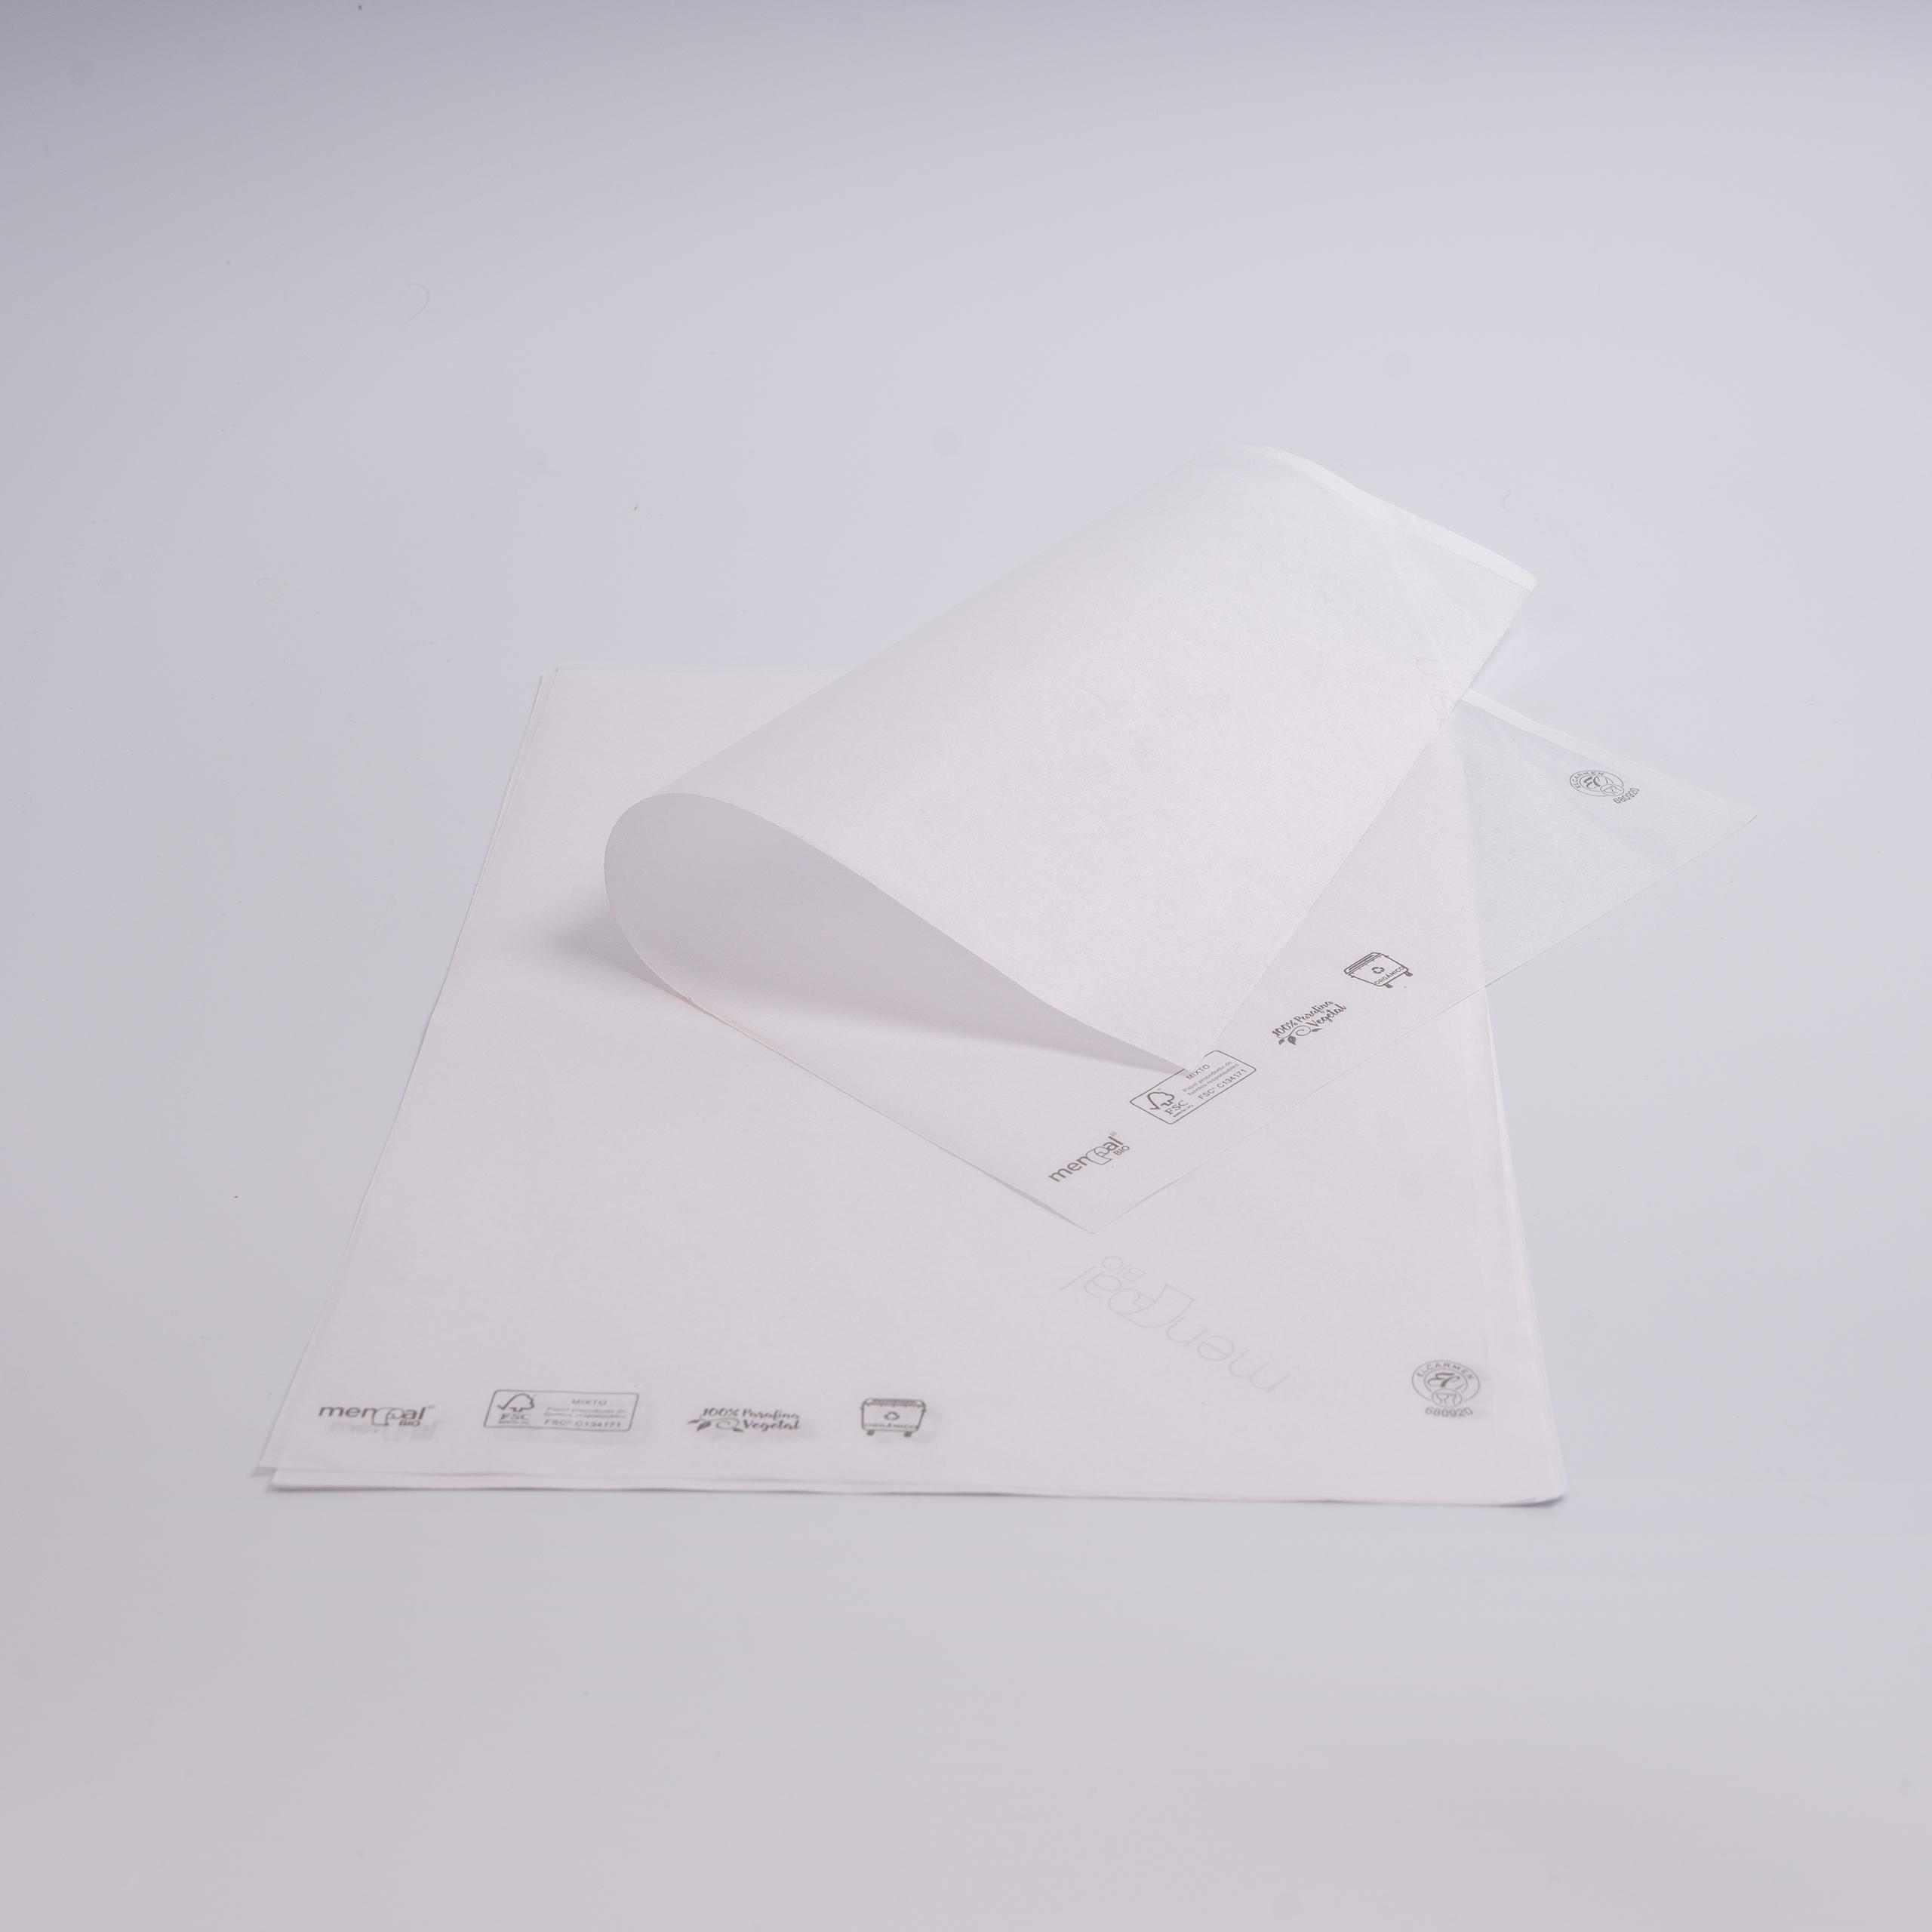 EL CARMEN Papel Menpal BIO FSC   biodegradable y compostable   38 X 54 cm